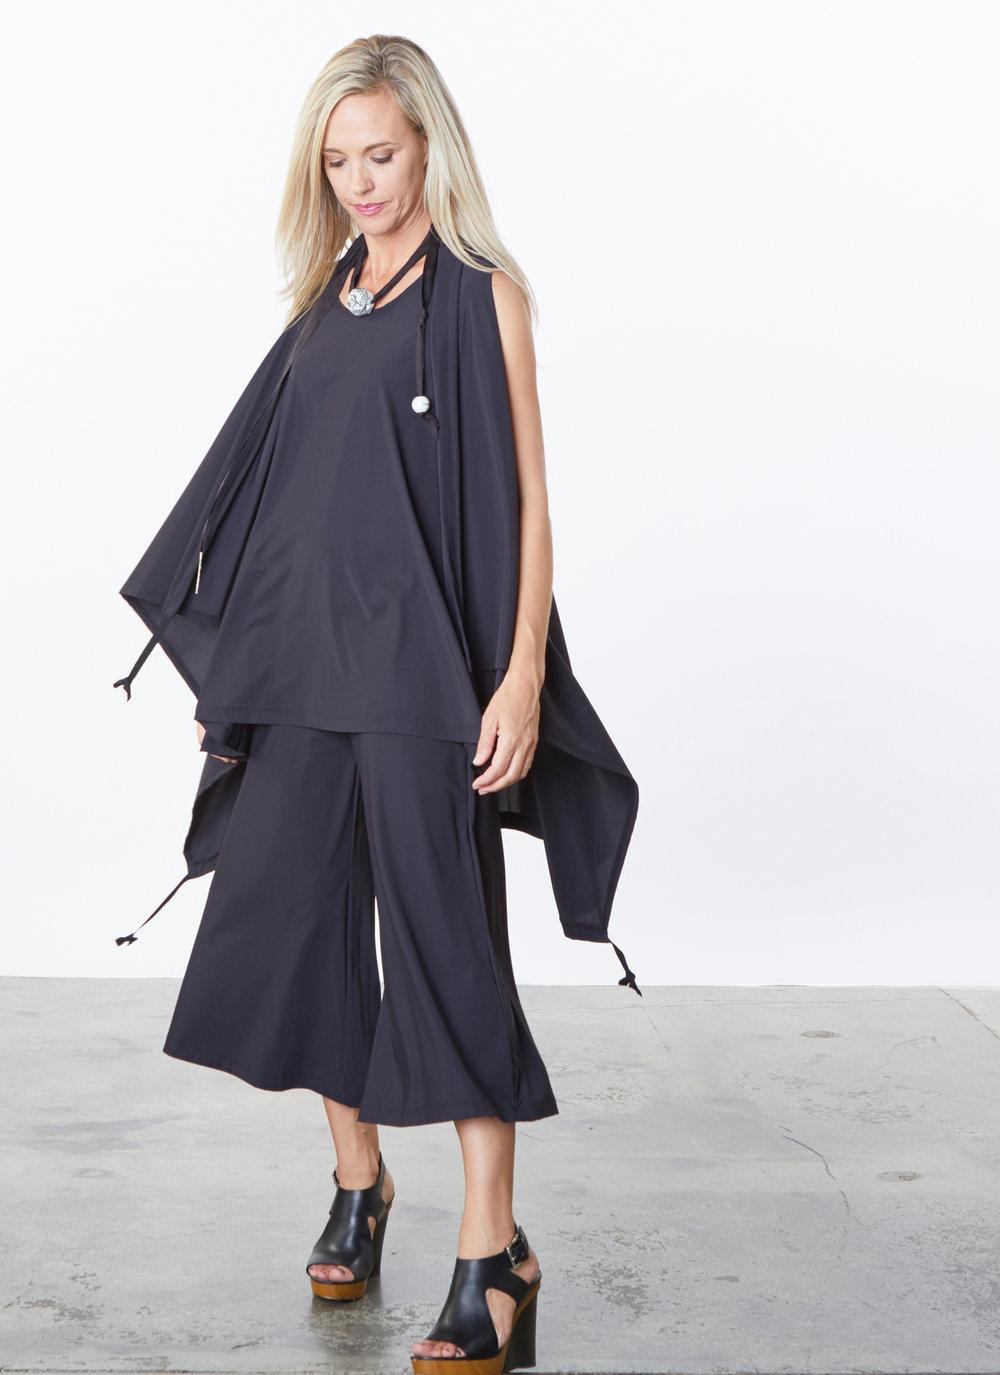 Eve Vest, Aldous Tunic, Ella Pant in Black Microfiber Jersey